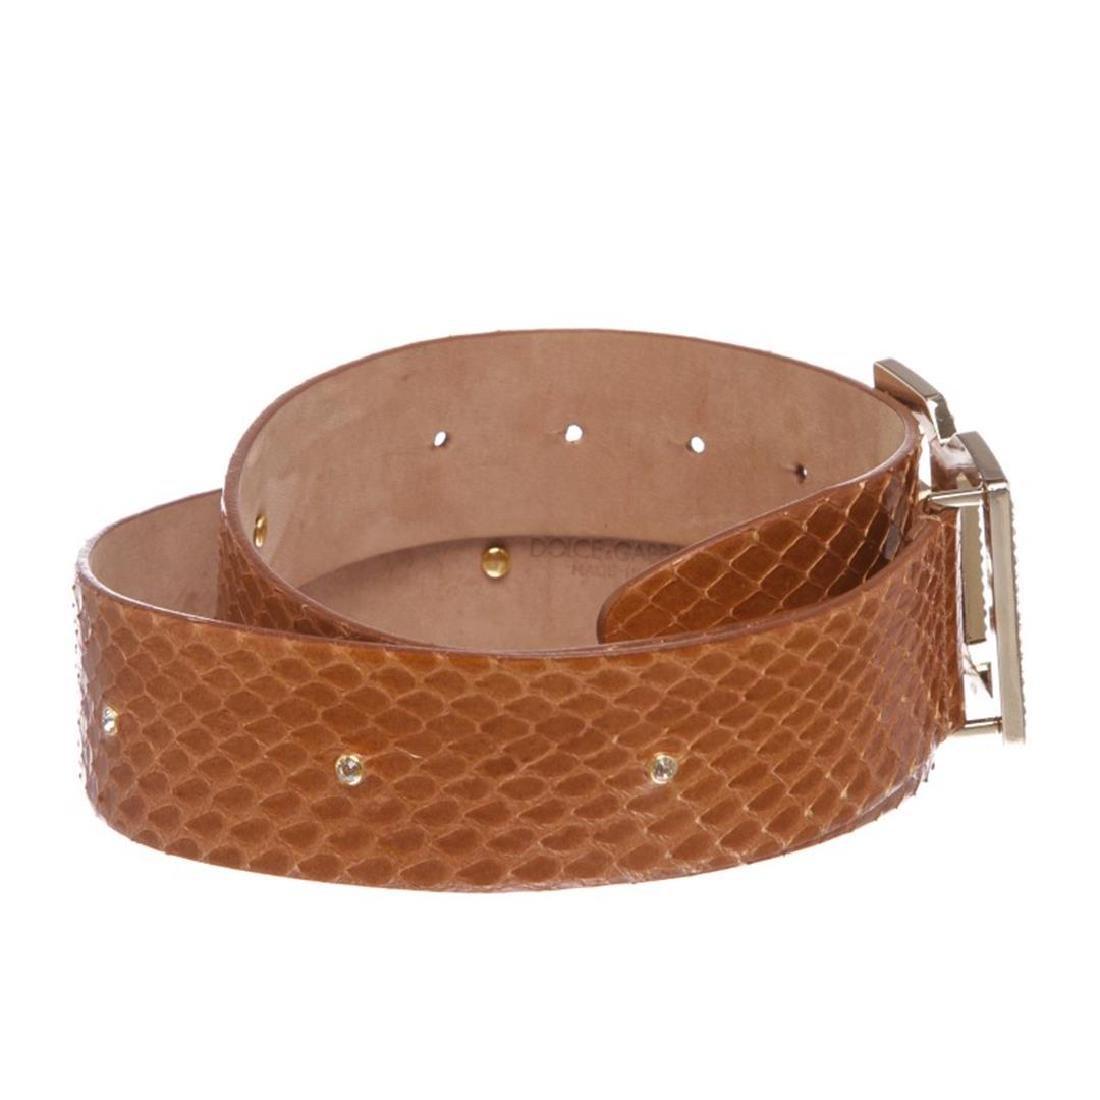 Dolce & Gabbana Brown Snakeskin Rhinestone Buckle Belt - 2